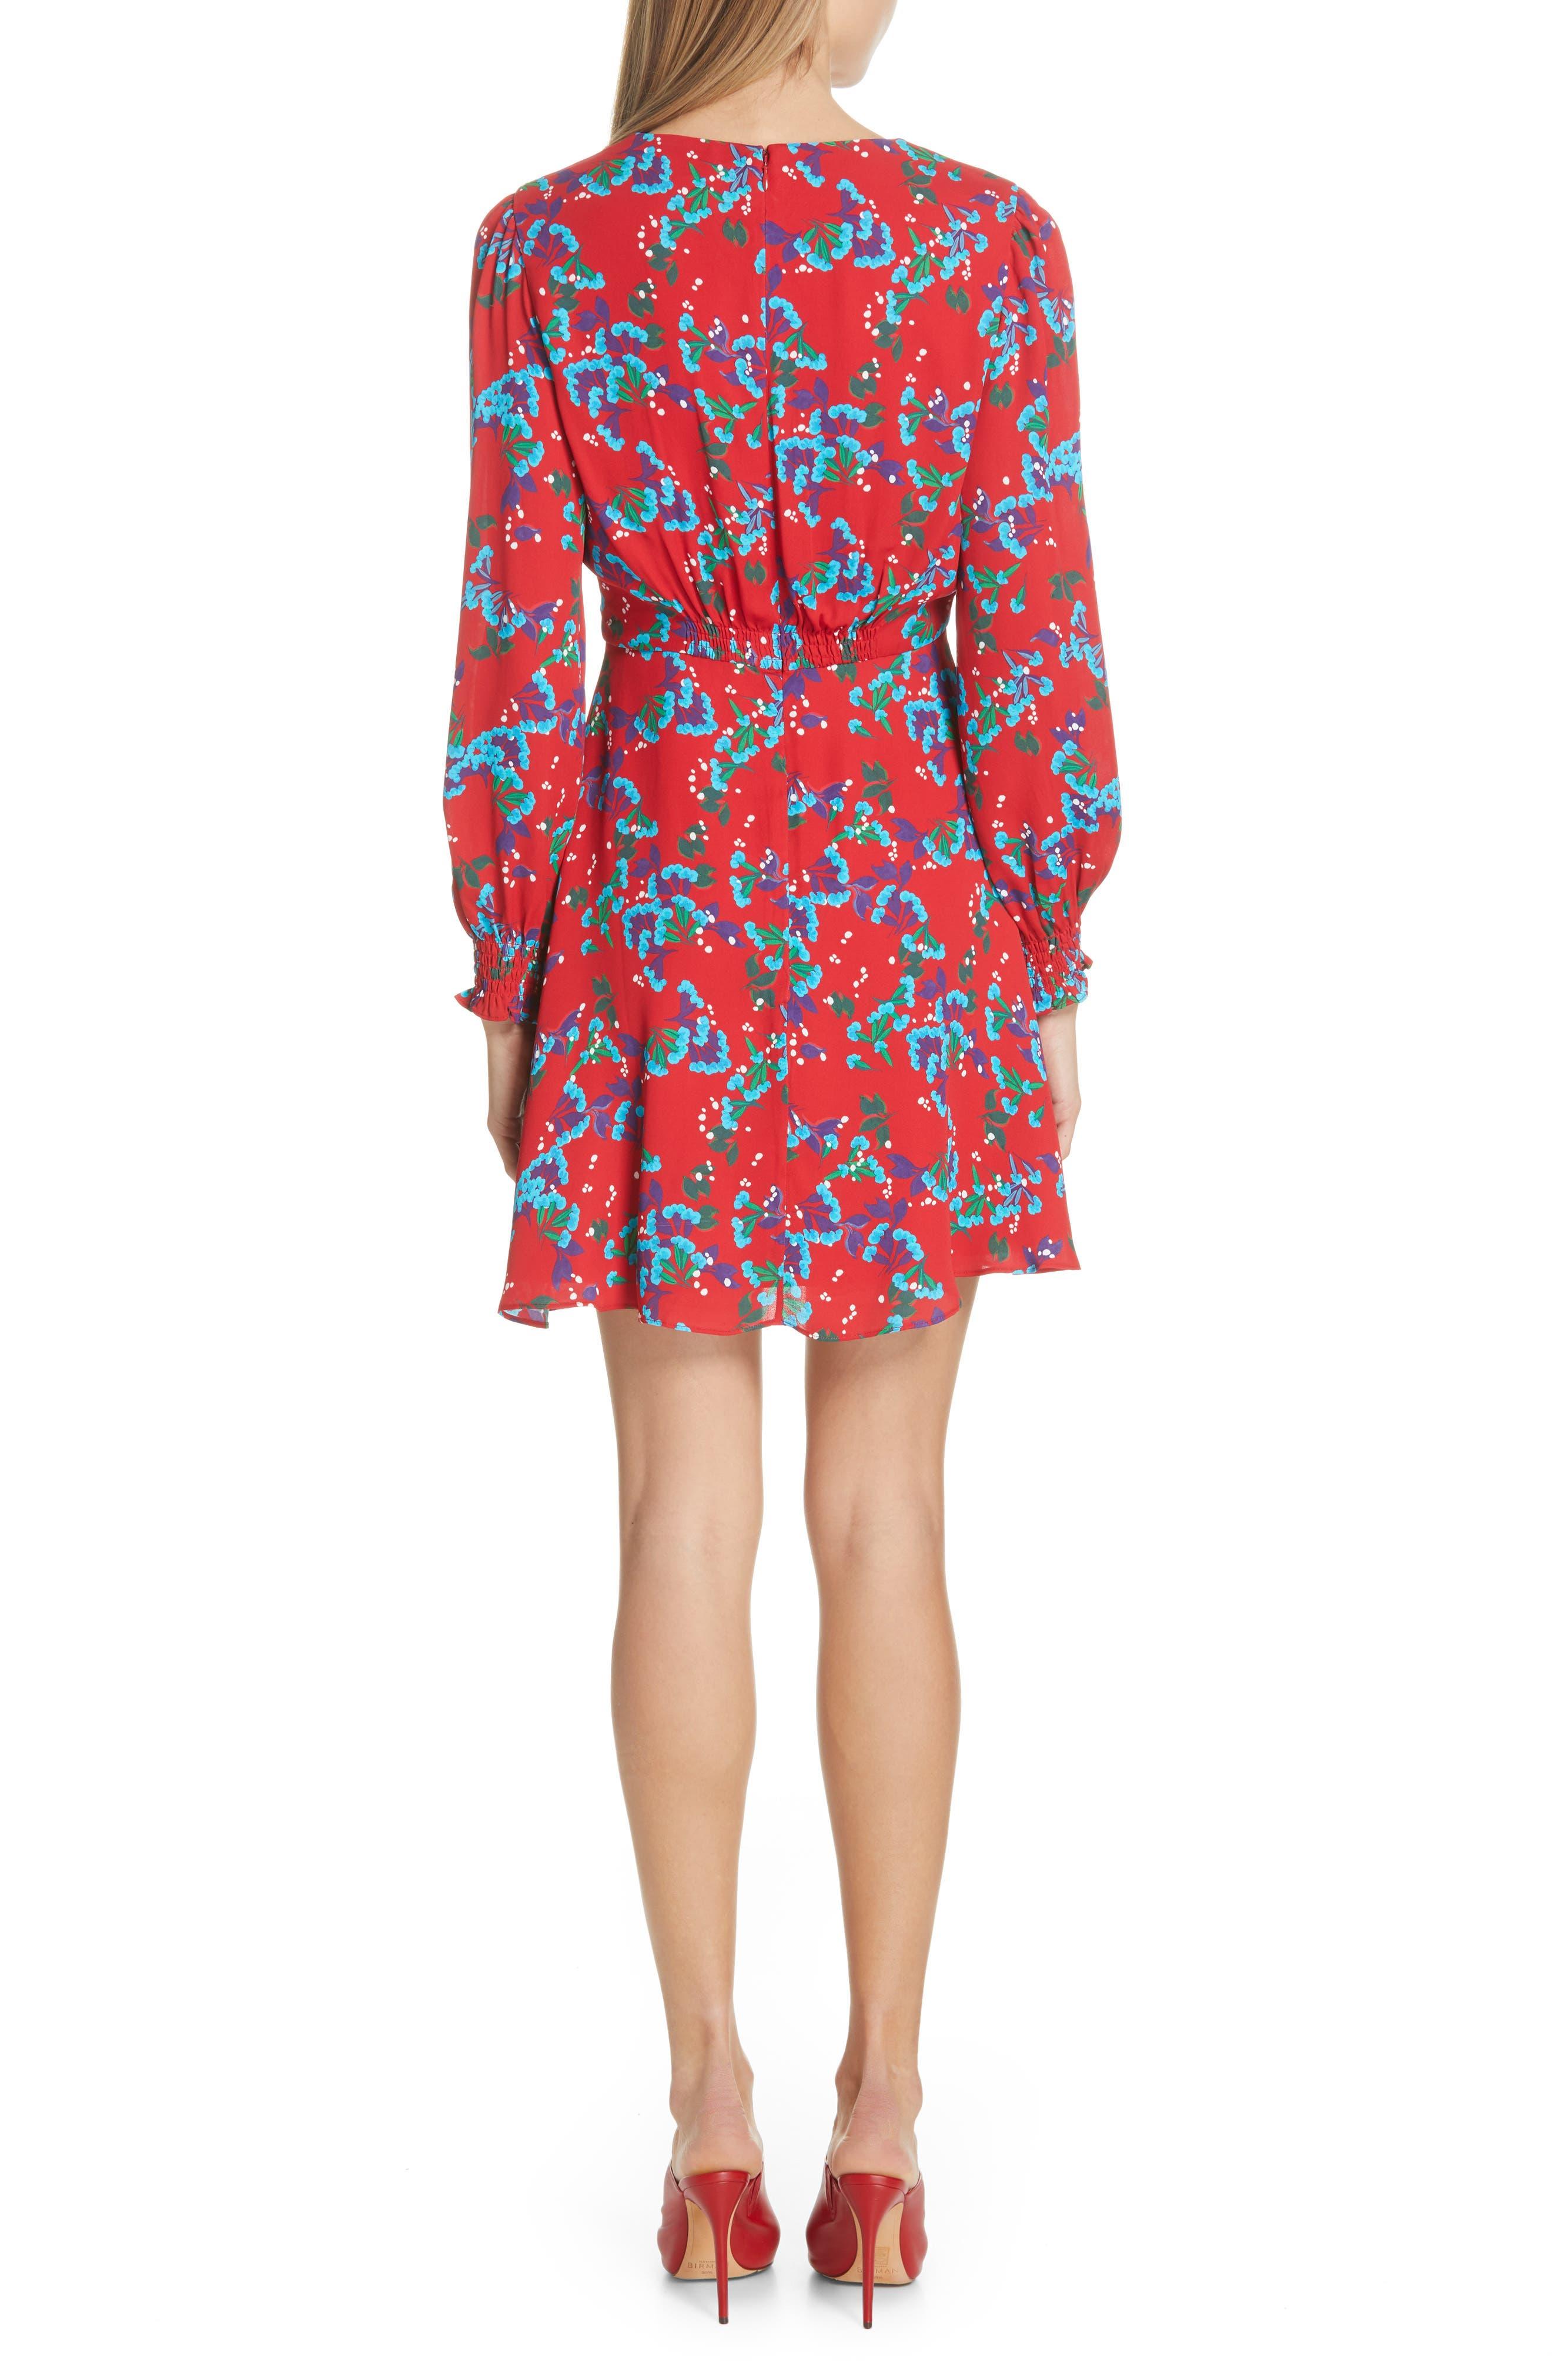 Eve Floral Print Dress,                             Alternate thumbnail 2, color,                             SCARLET SWEETPEAS